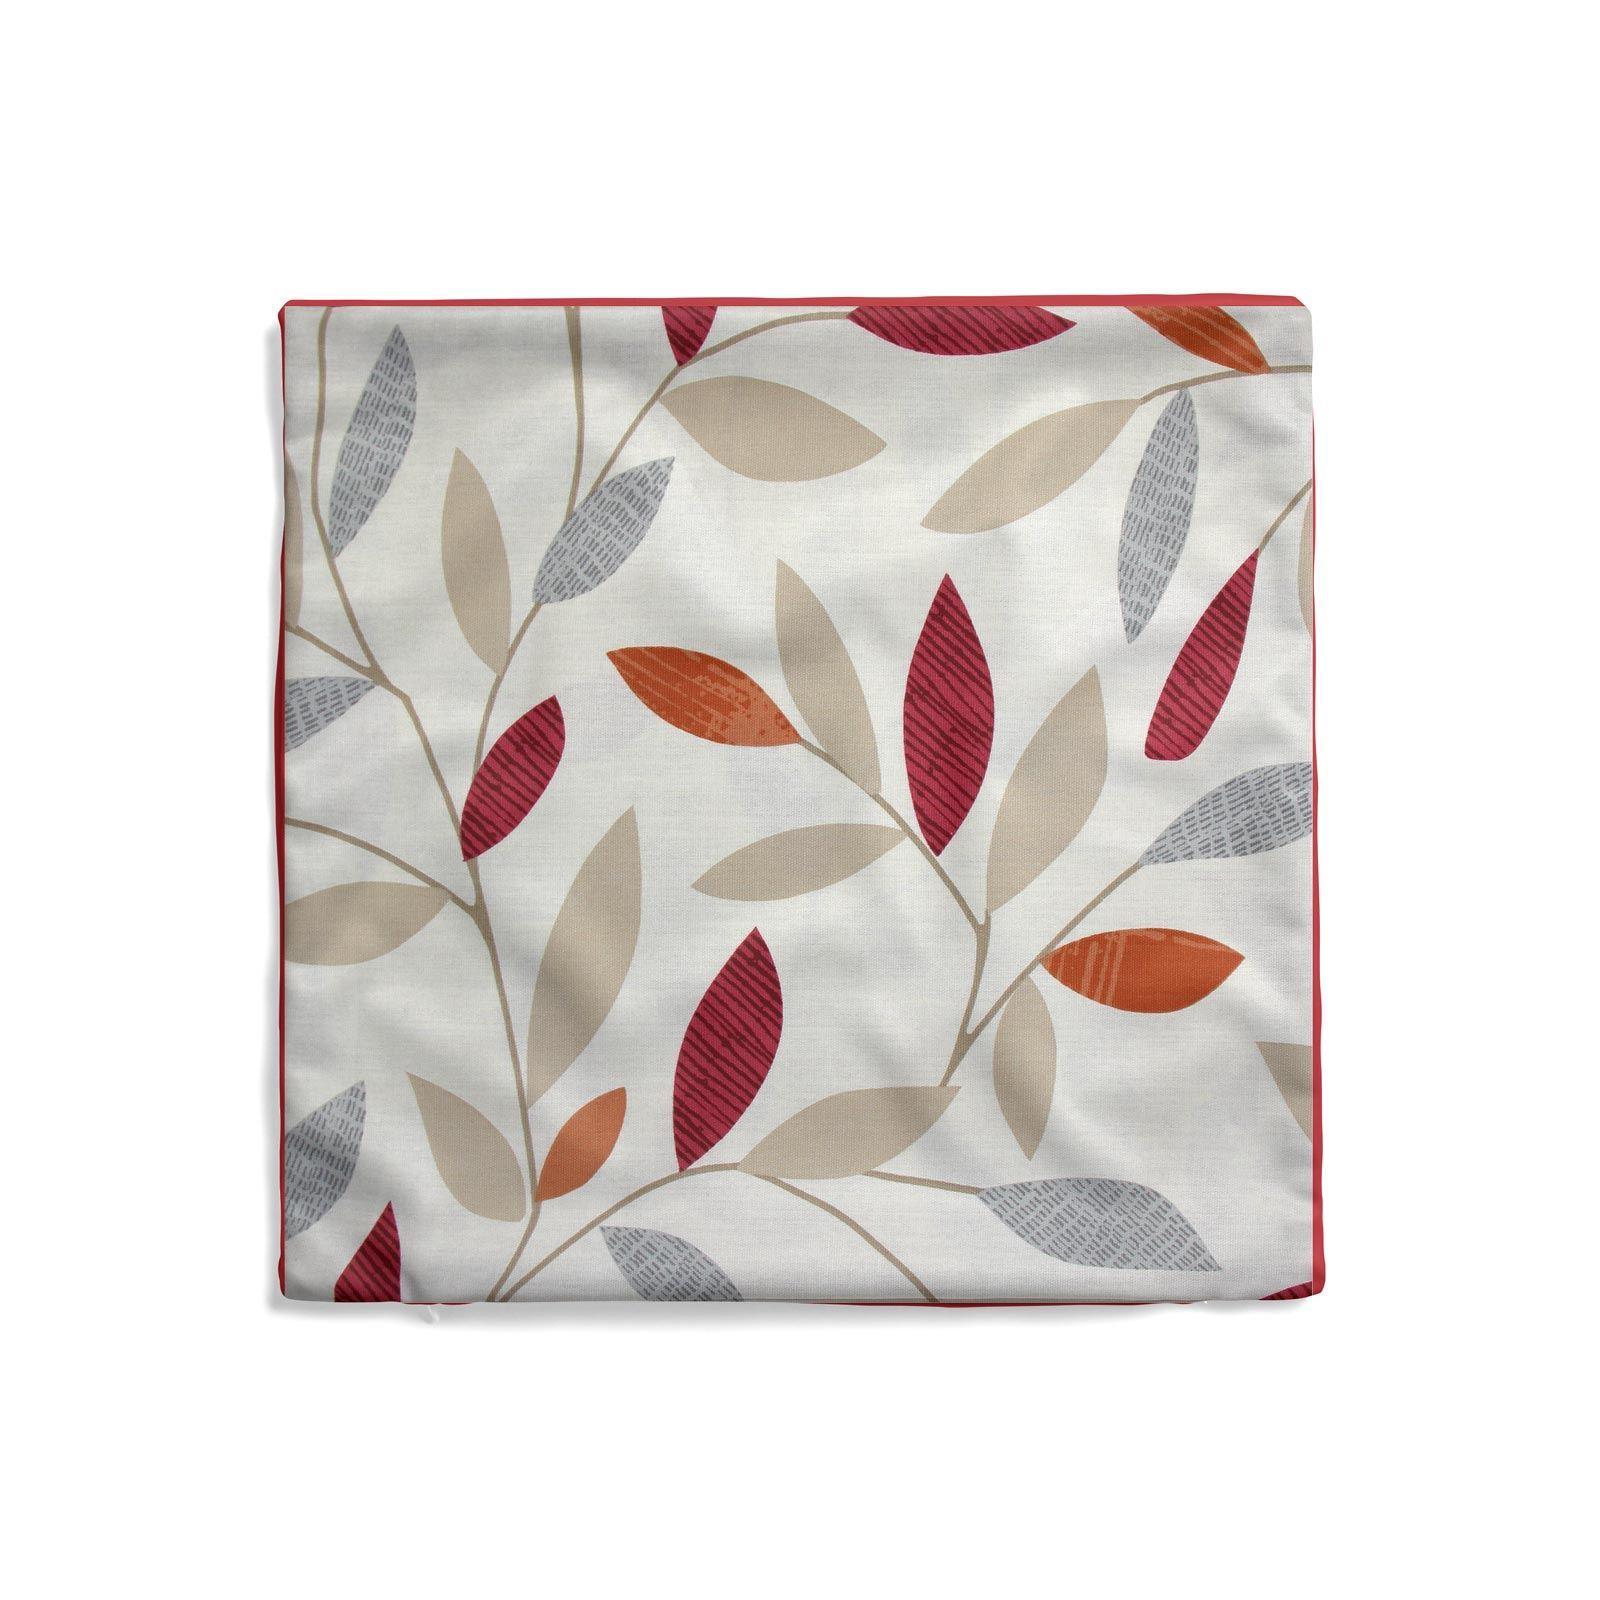 Vino-Tinto-Cushion-Covers-Coleccion-17-034-18-034-43cm-45cm-Cubierta miniatura 45